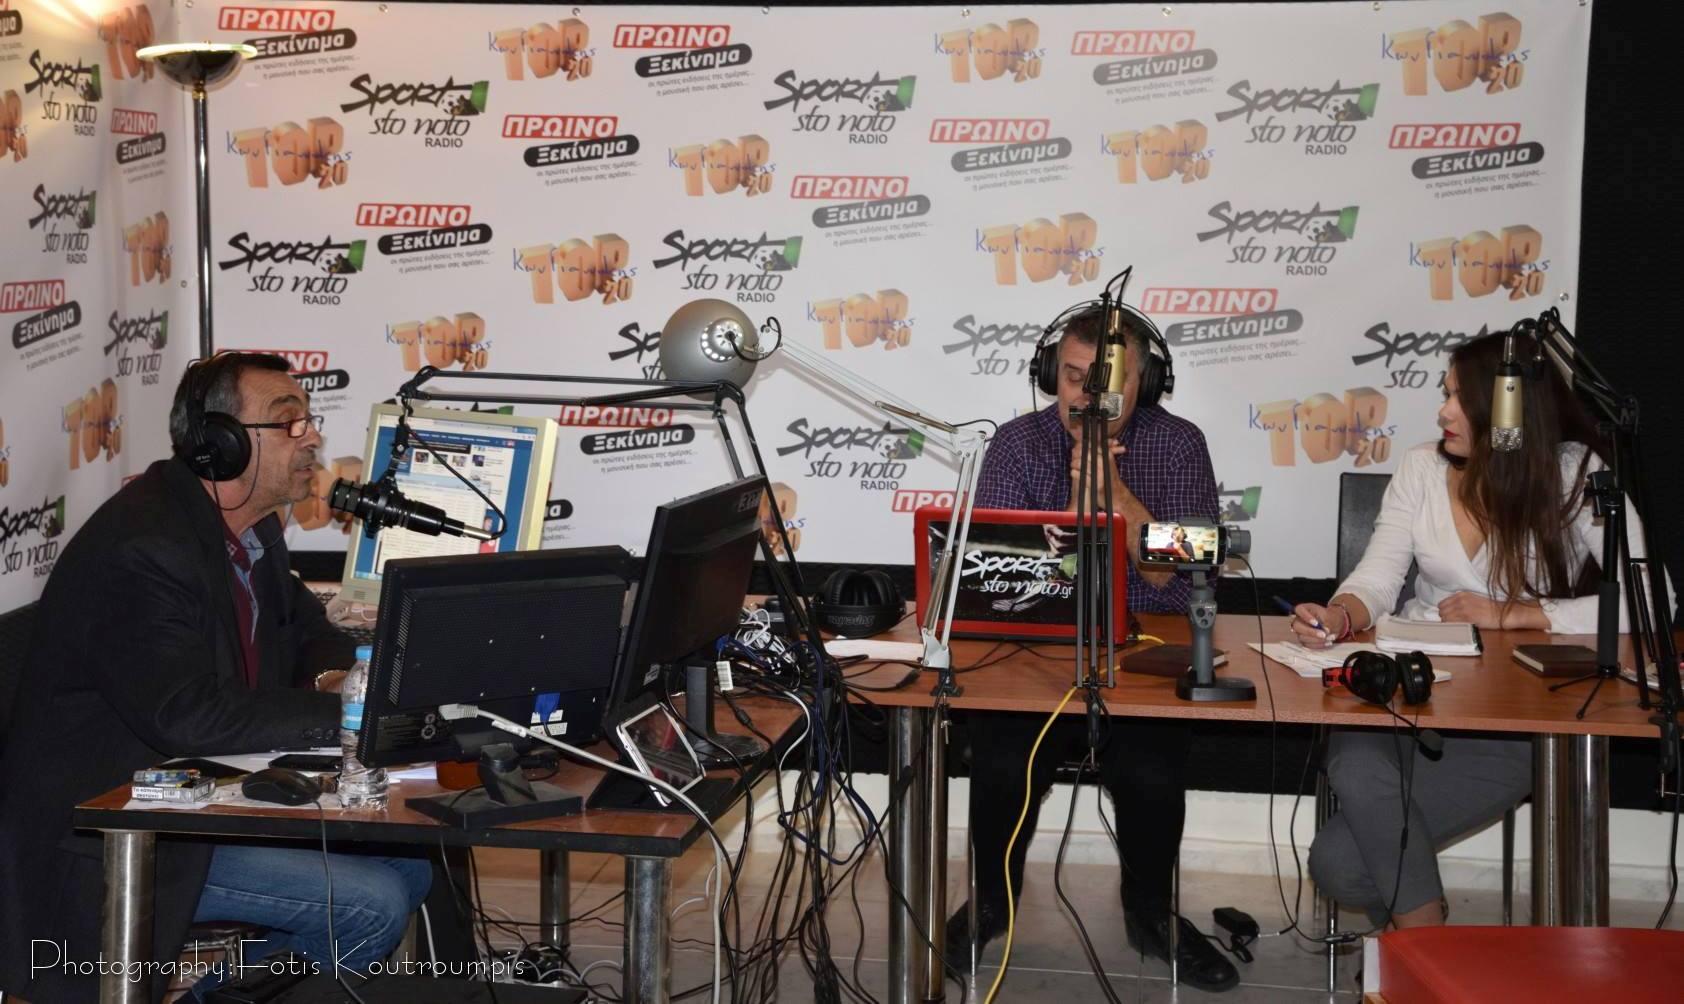 Sport Sto Noto Radio σήμερα Δευτέρα, με το… Ασπρόπυργος – Μαύρη Θύελλα (6 με 9 μ.μ.)!